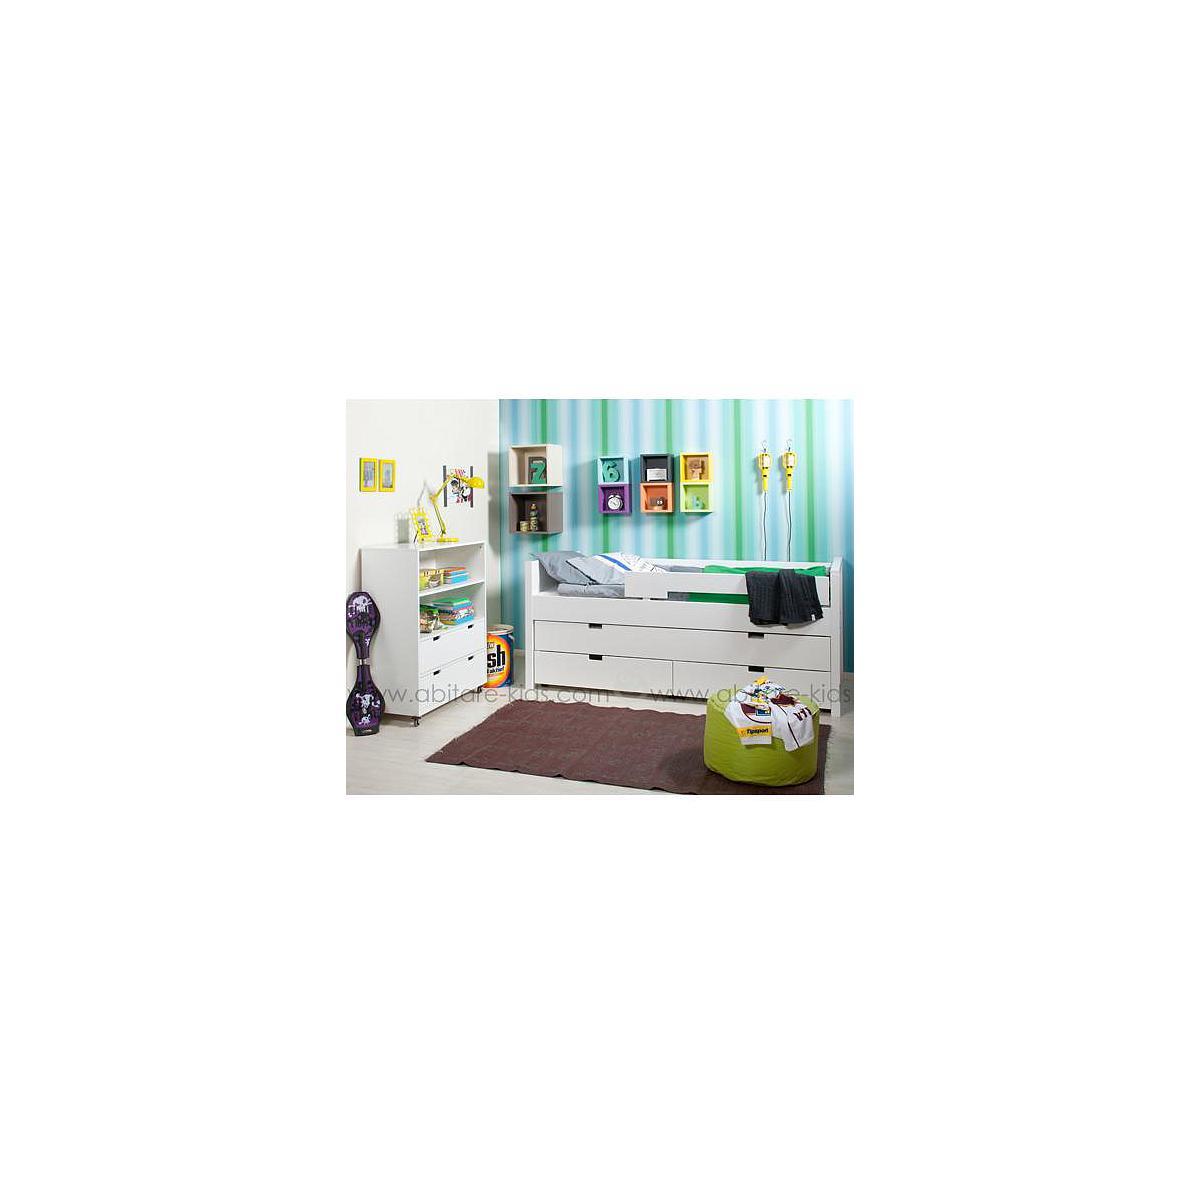 COMBIFLEX by Bopita lit compact avec tiroirs + armoire